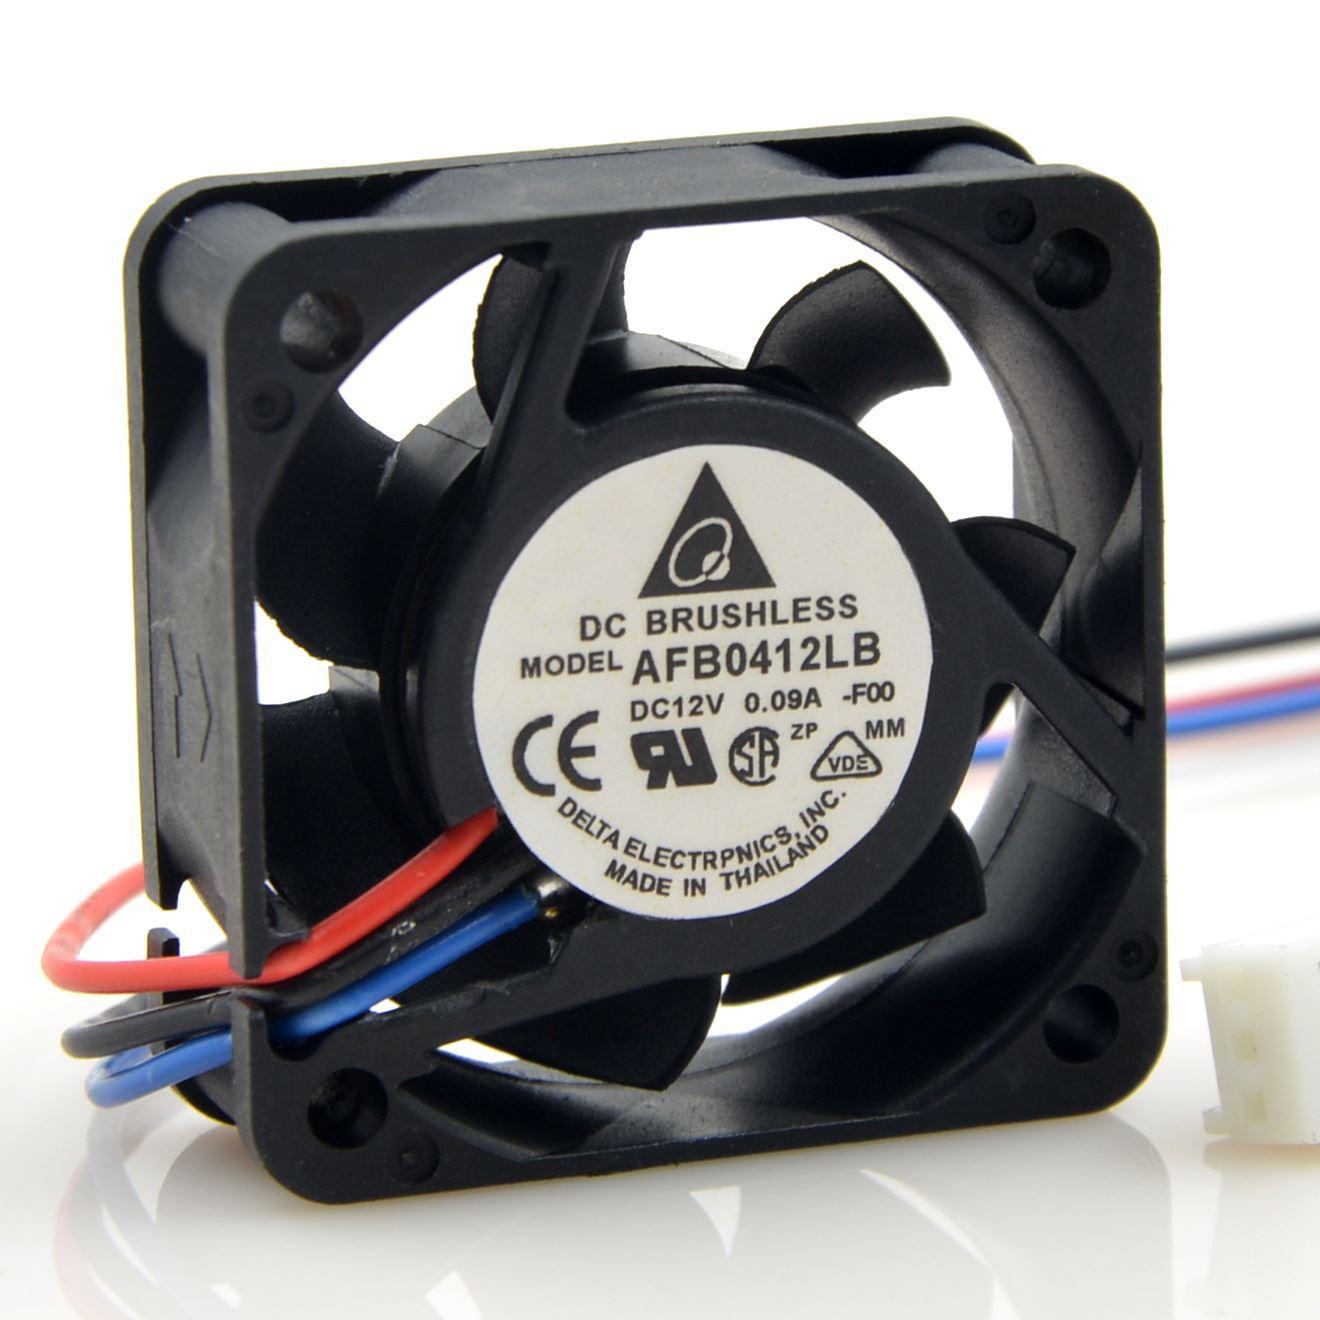 Delta AFB0412LB 4015 12V 0.09A ventilador de refrigeración axial